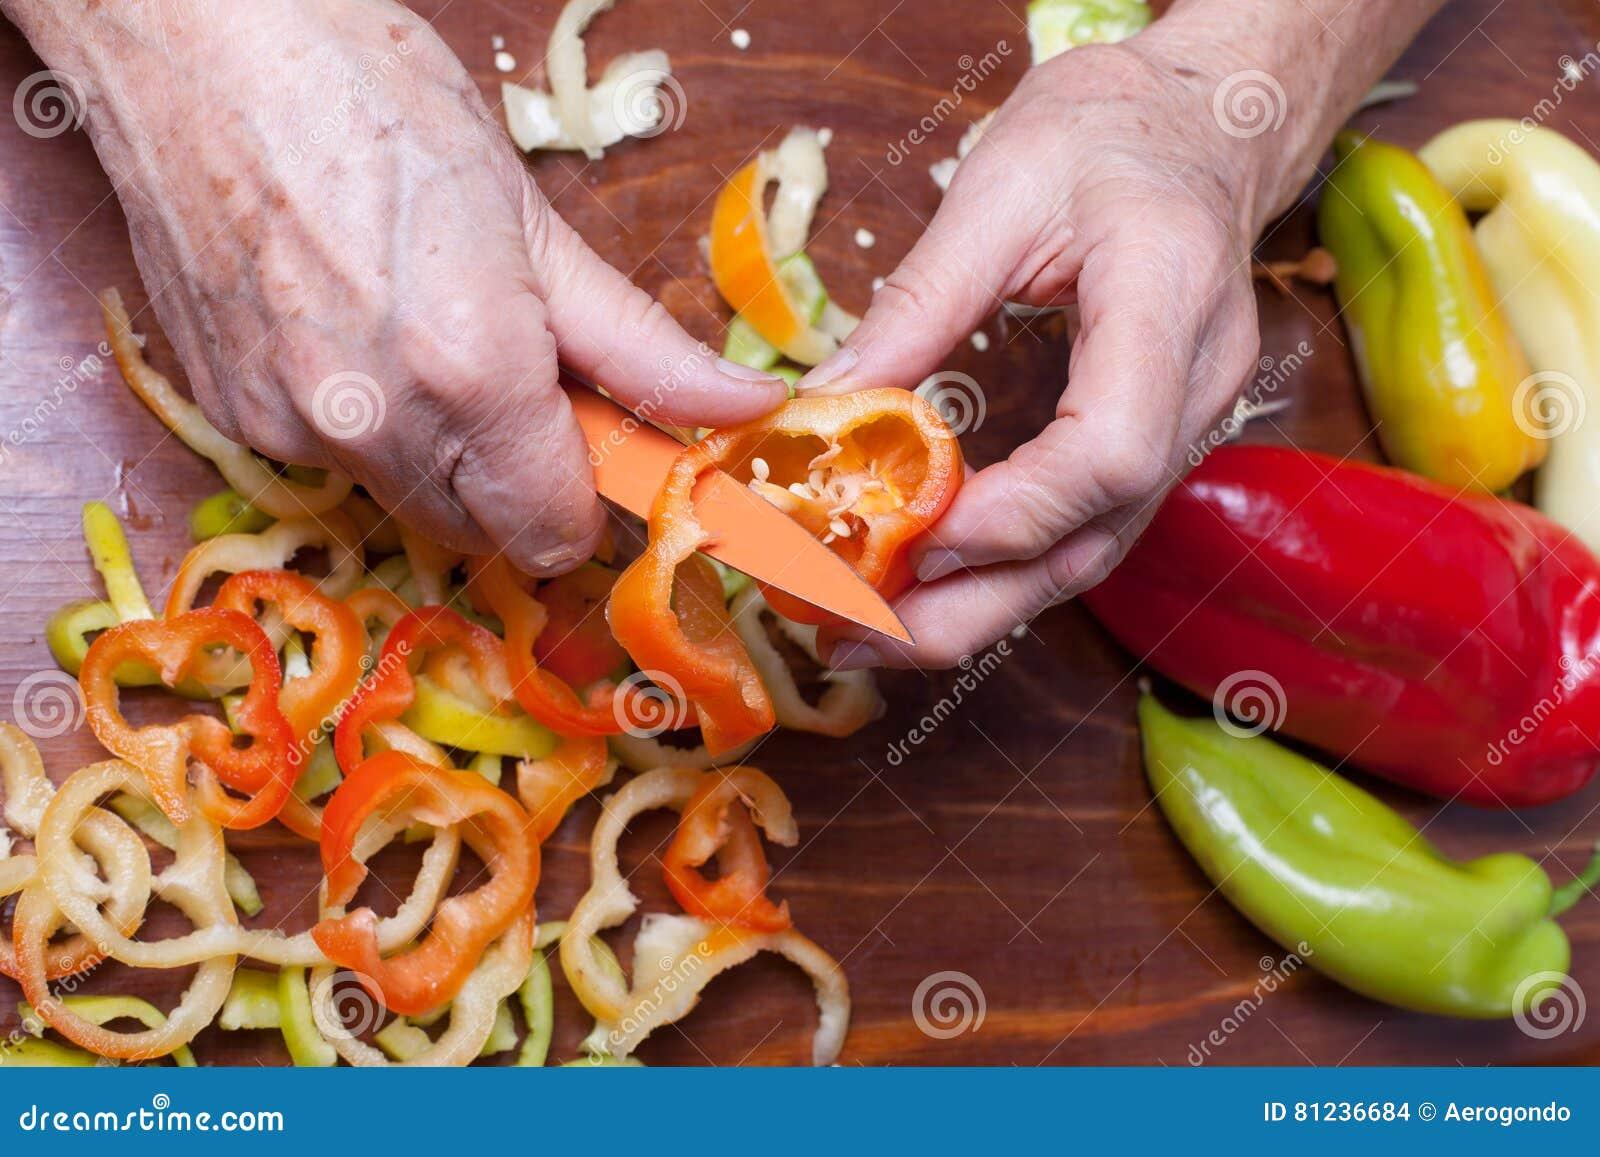 Oudere vrouwen scherpe peper